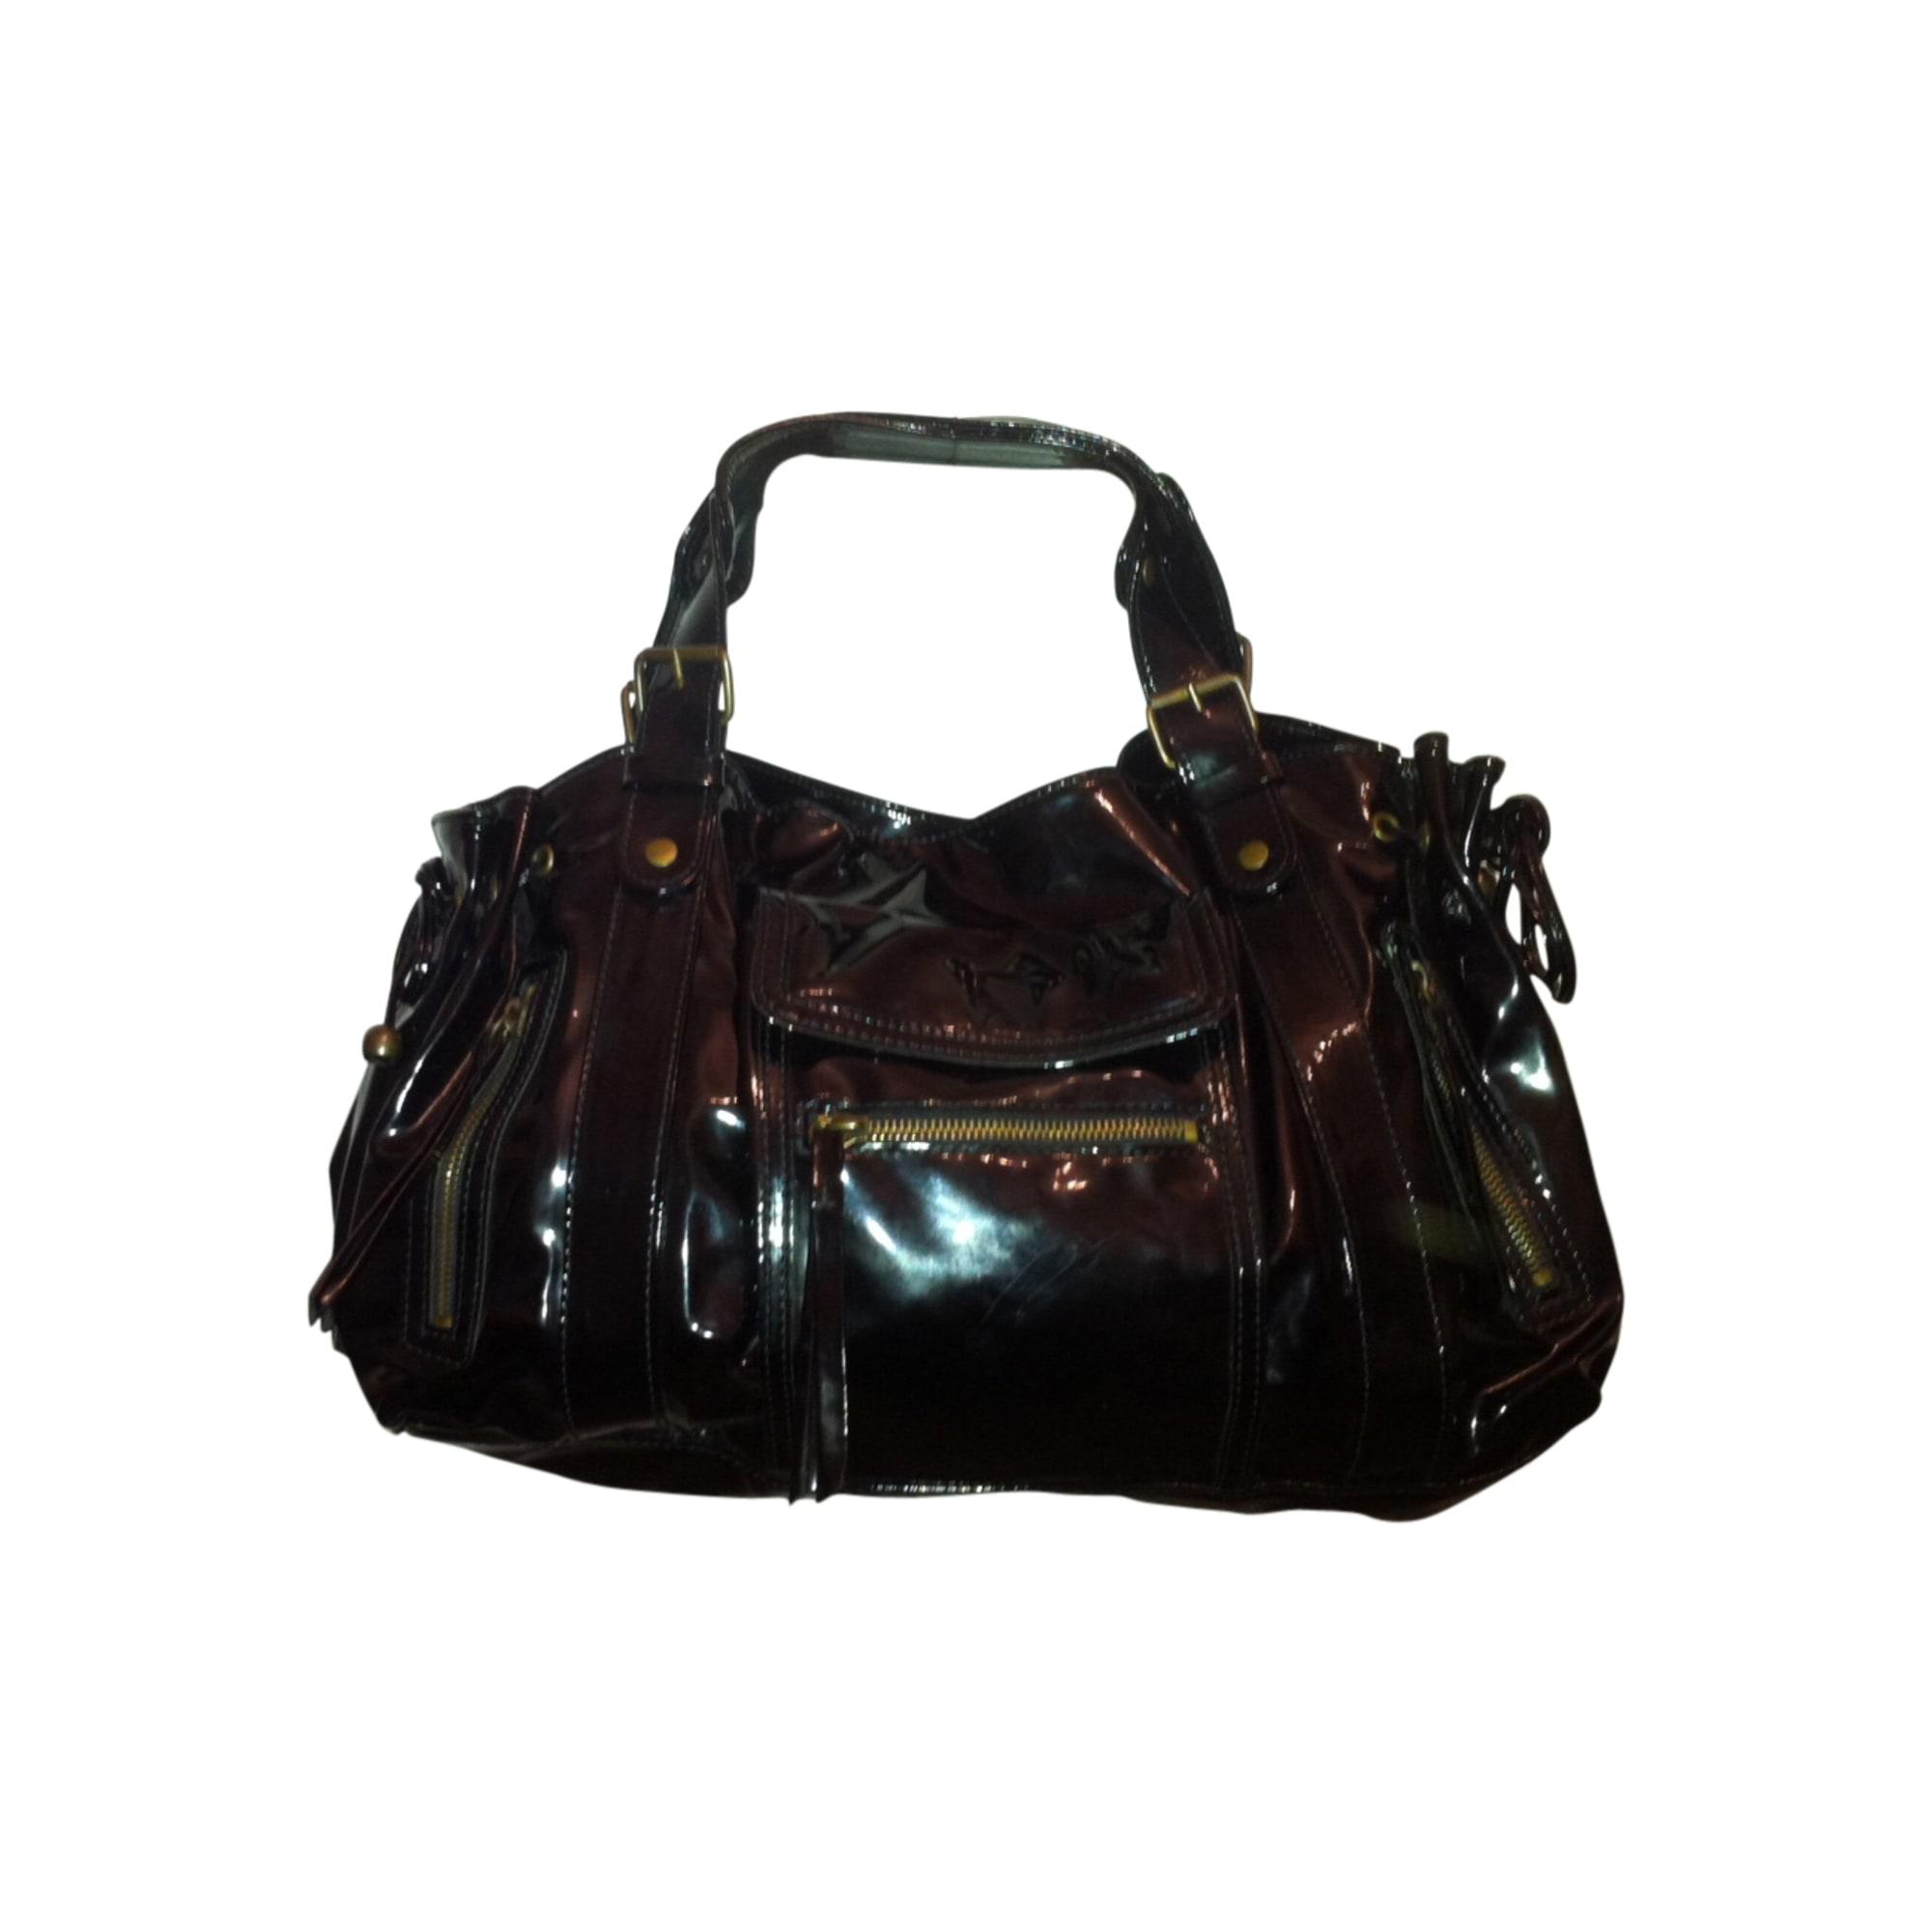 Shopname525688 à cuir vendu GERARD DAREL noir main 1831531 en par Sac zTtwd4xT